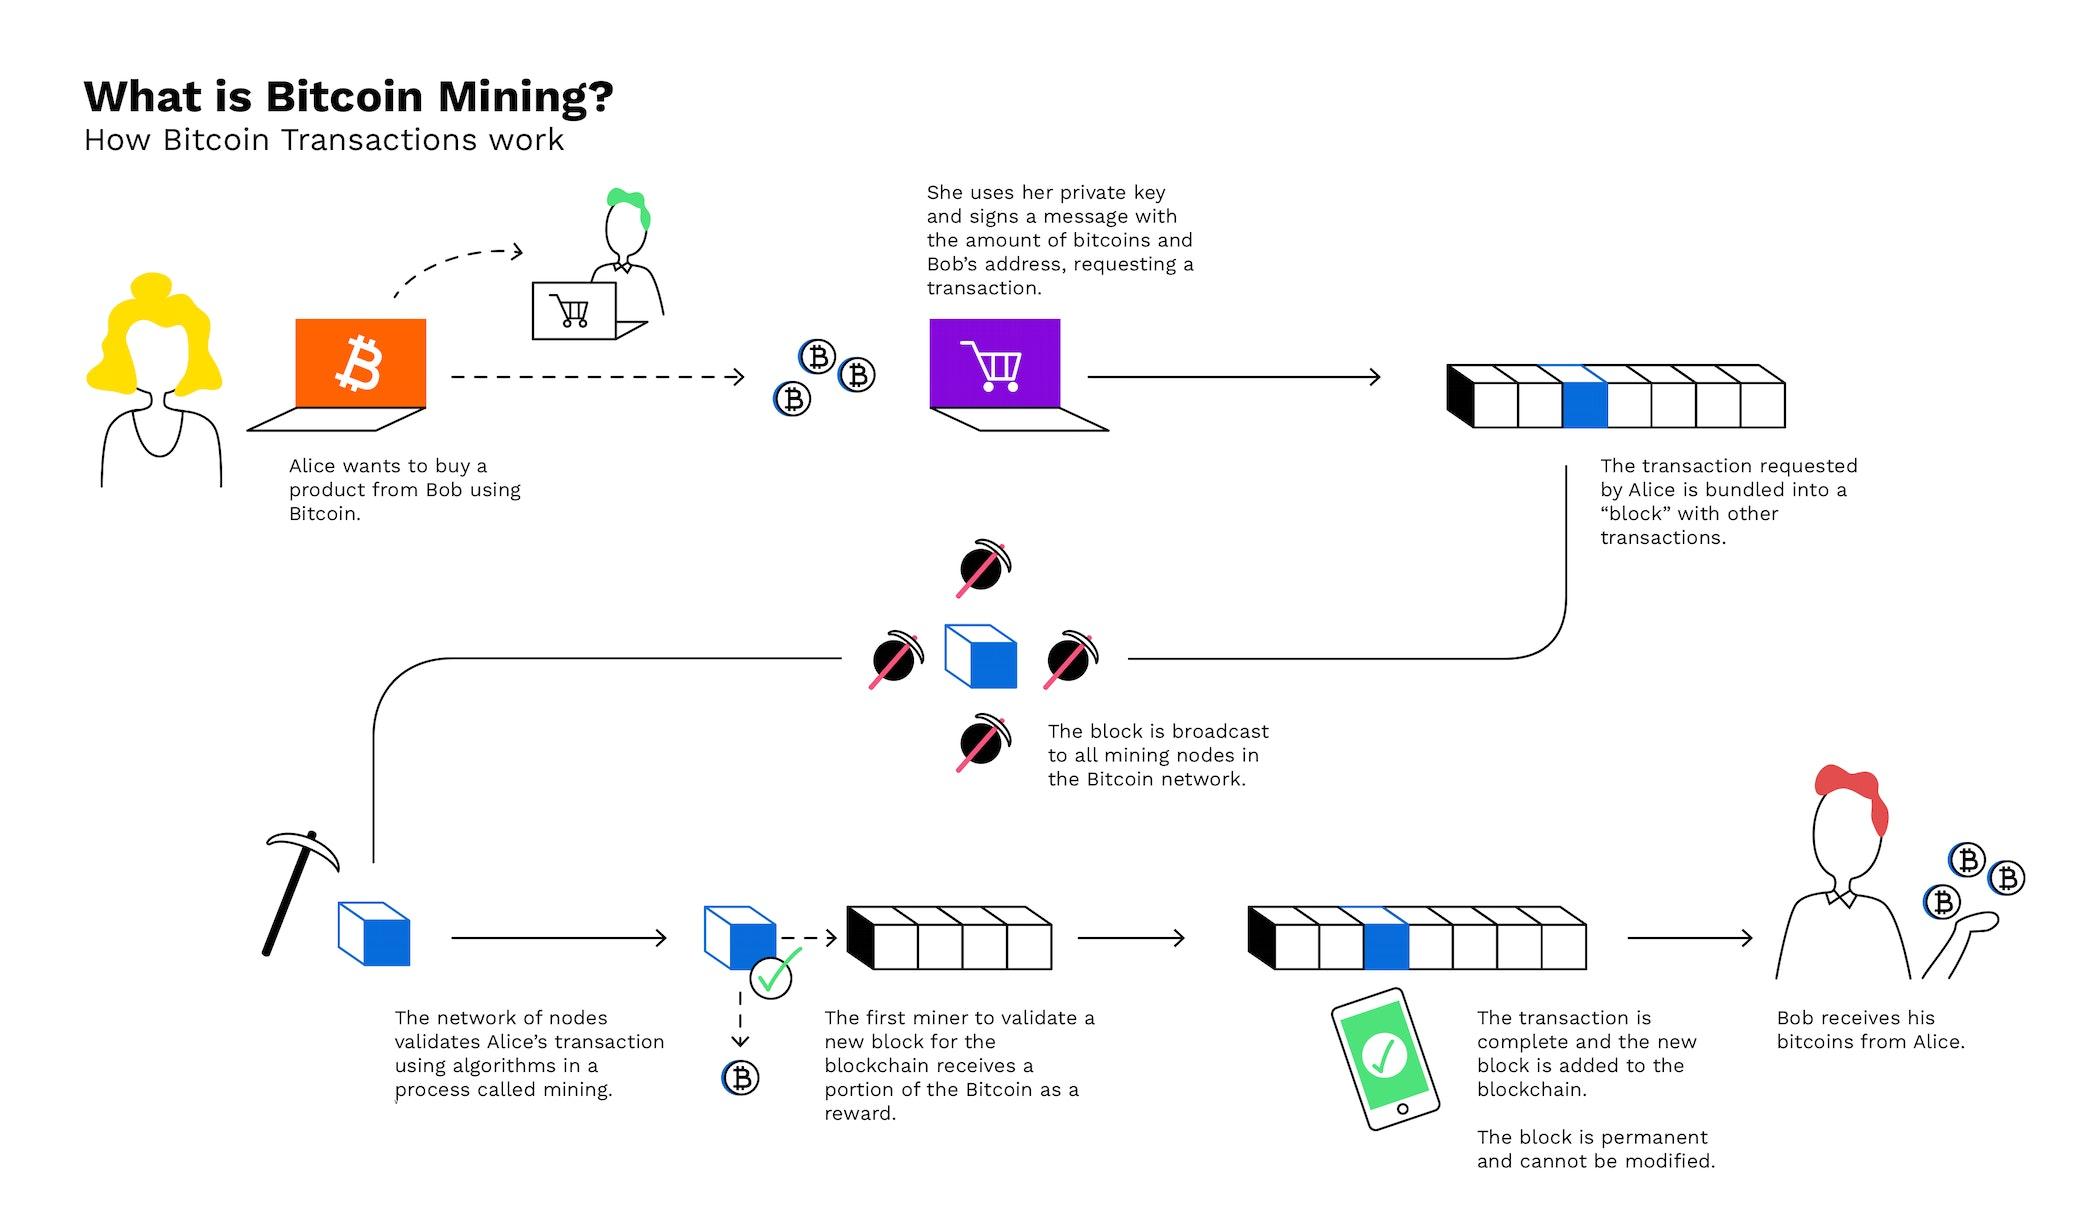 algoritm minier bitcoin)